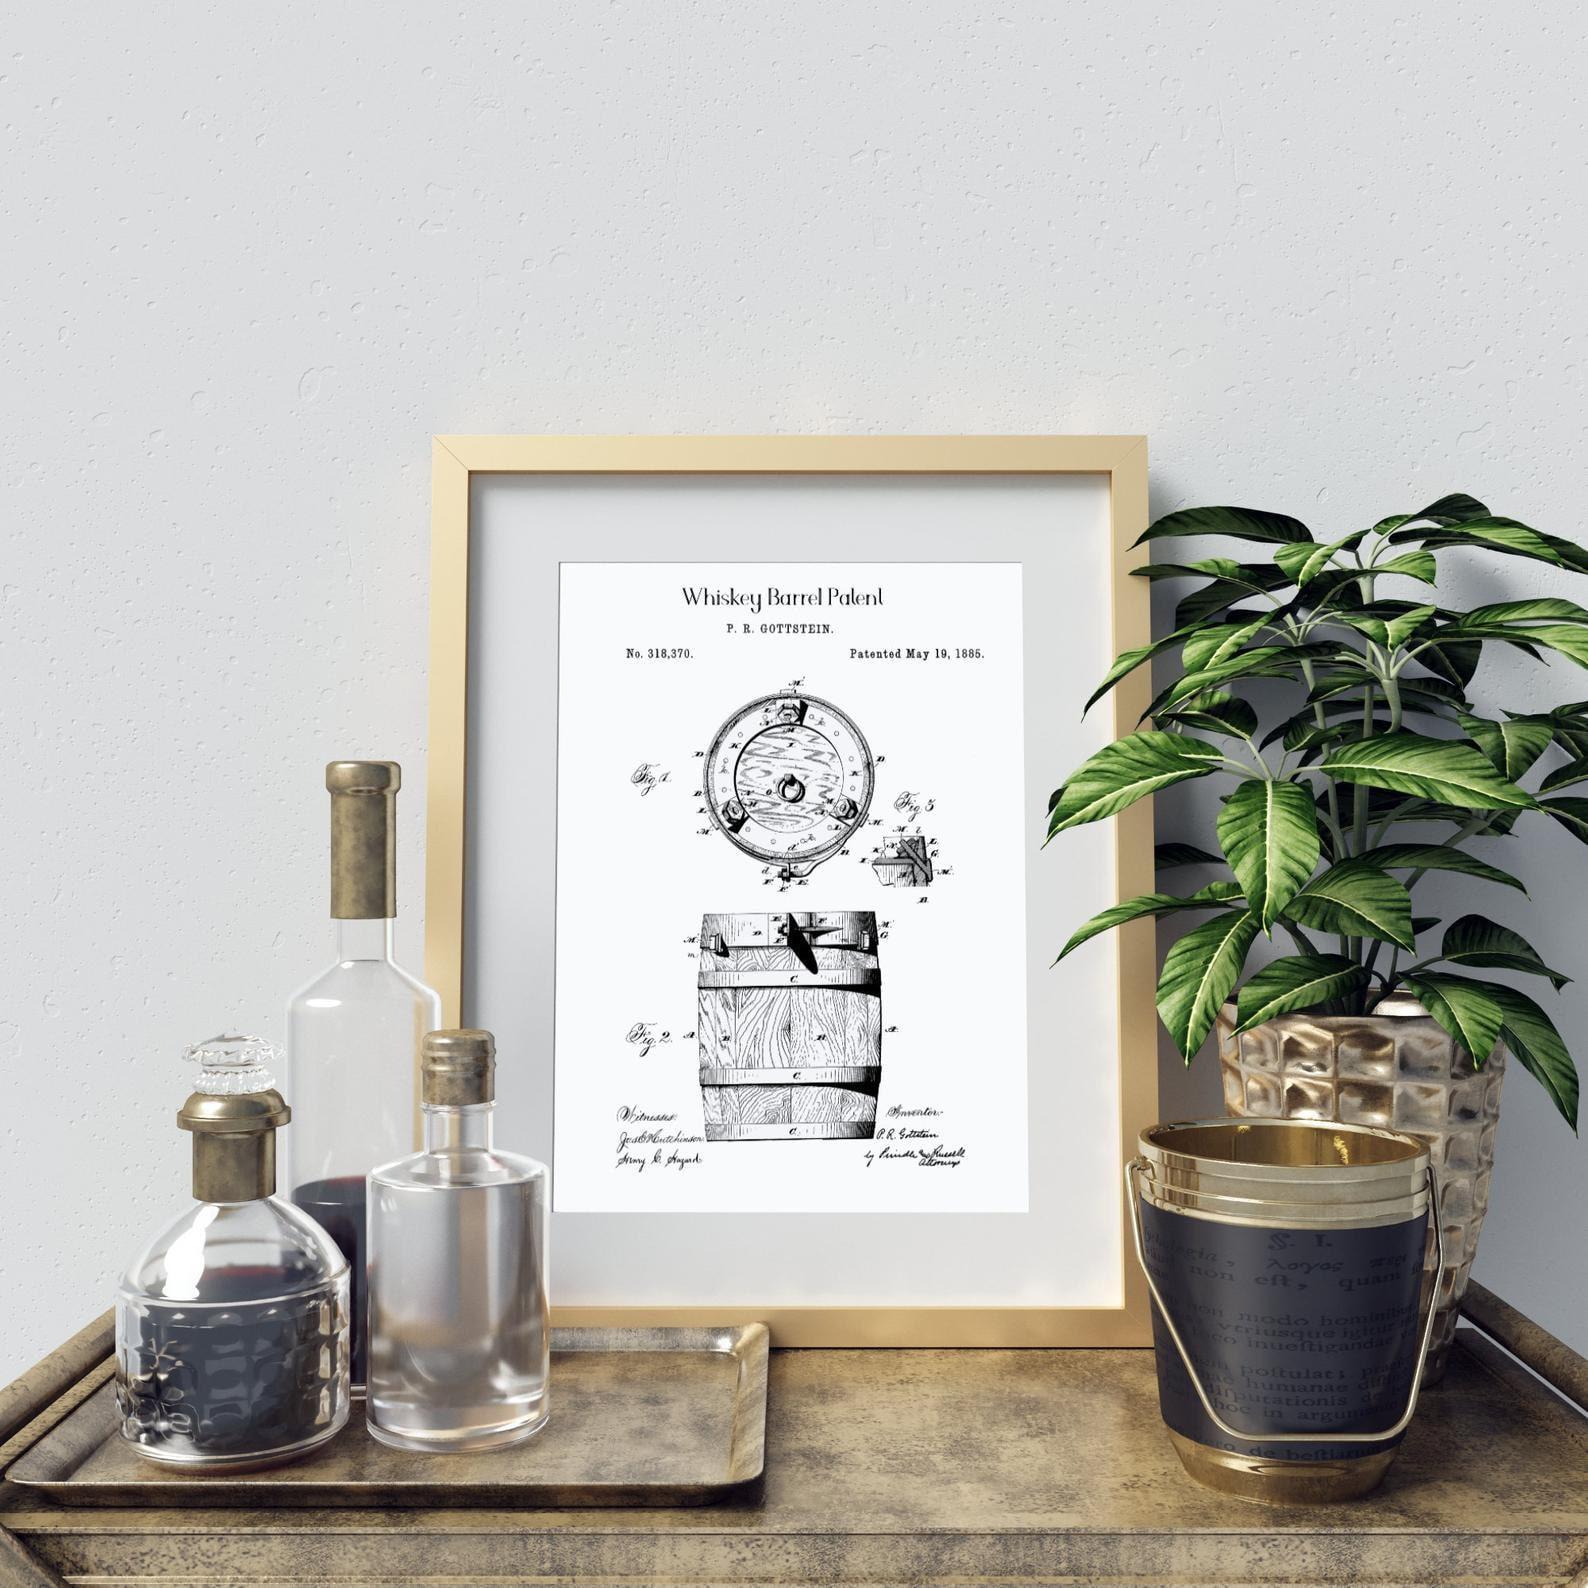 Whiskey barrel patent print